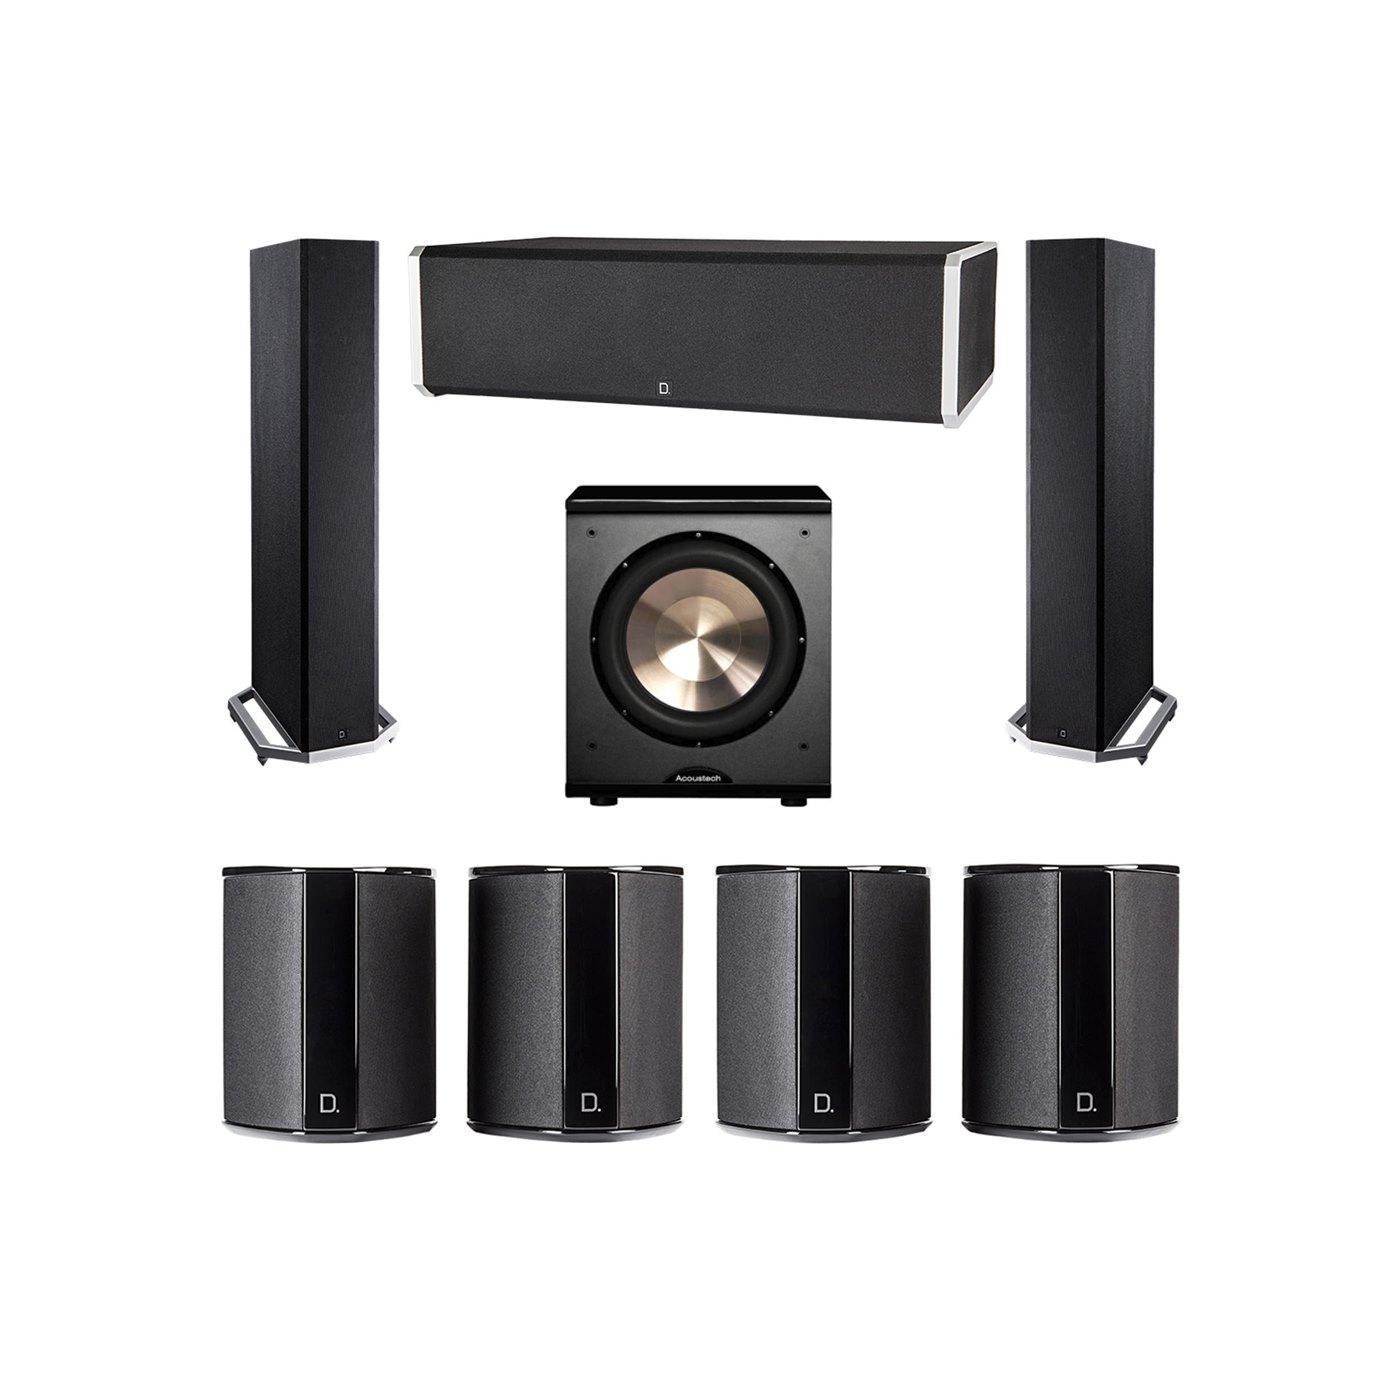 Definitive Technology 7.1 System with 2 BP9020 Tower Speakers, 1 CS9060 Center Channel Speaker, 4 SR9040 Surround Speaker, 1 BIC PL-200 Subwoofer